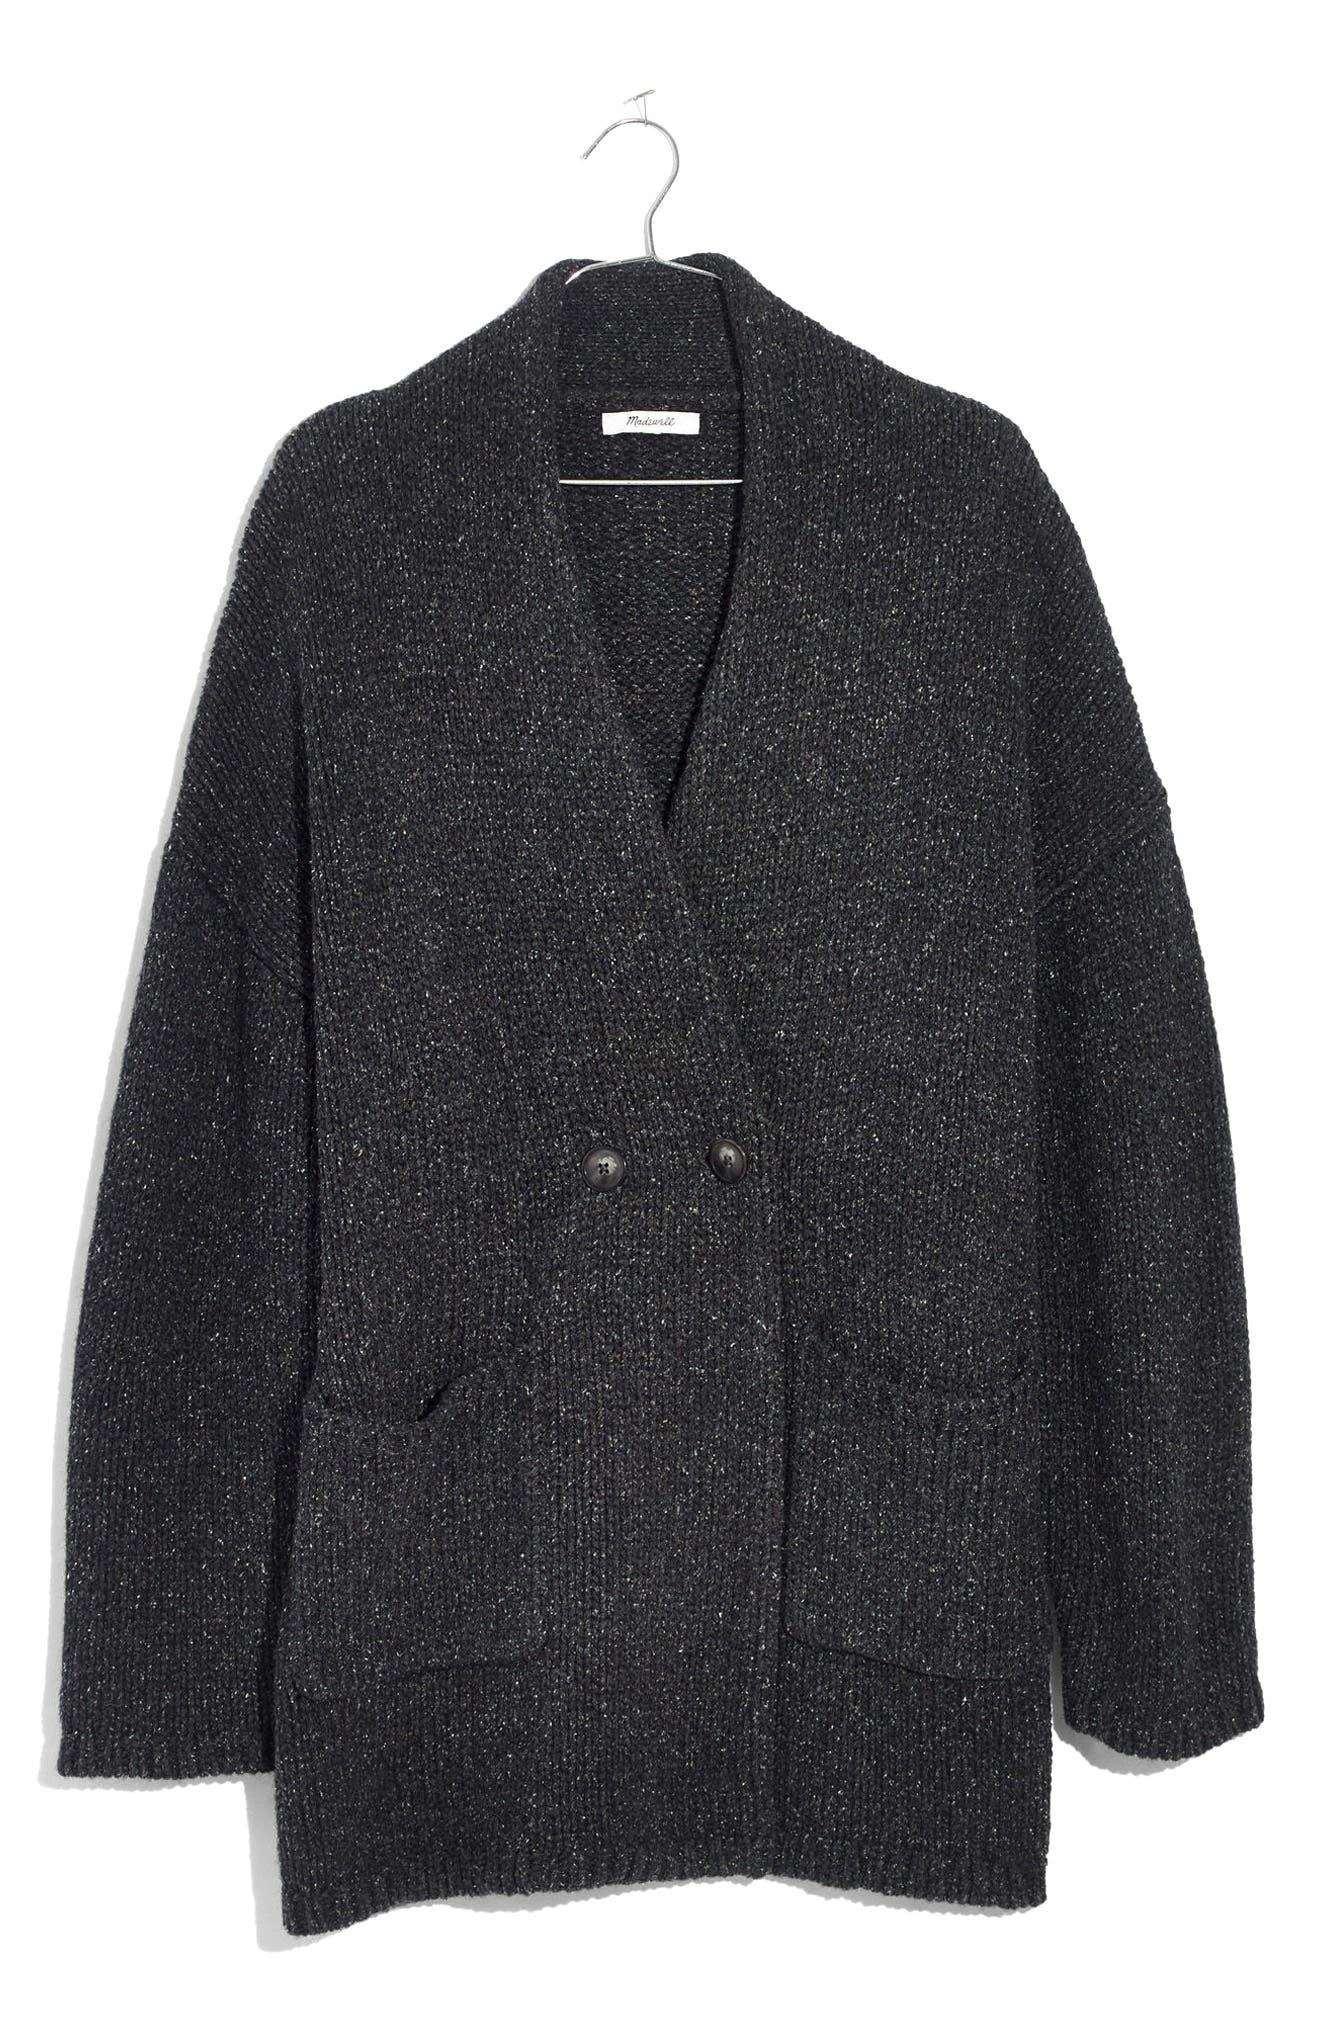 Glenhill Sweater Coat,                             Alternate thumbnail 4, color,